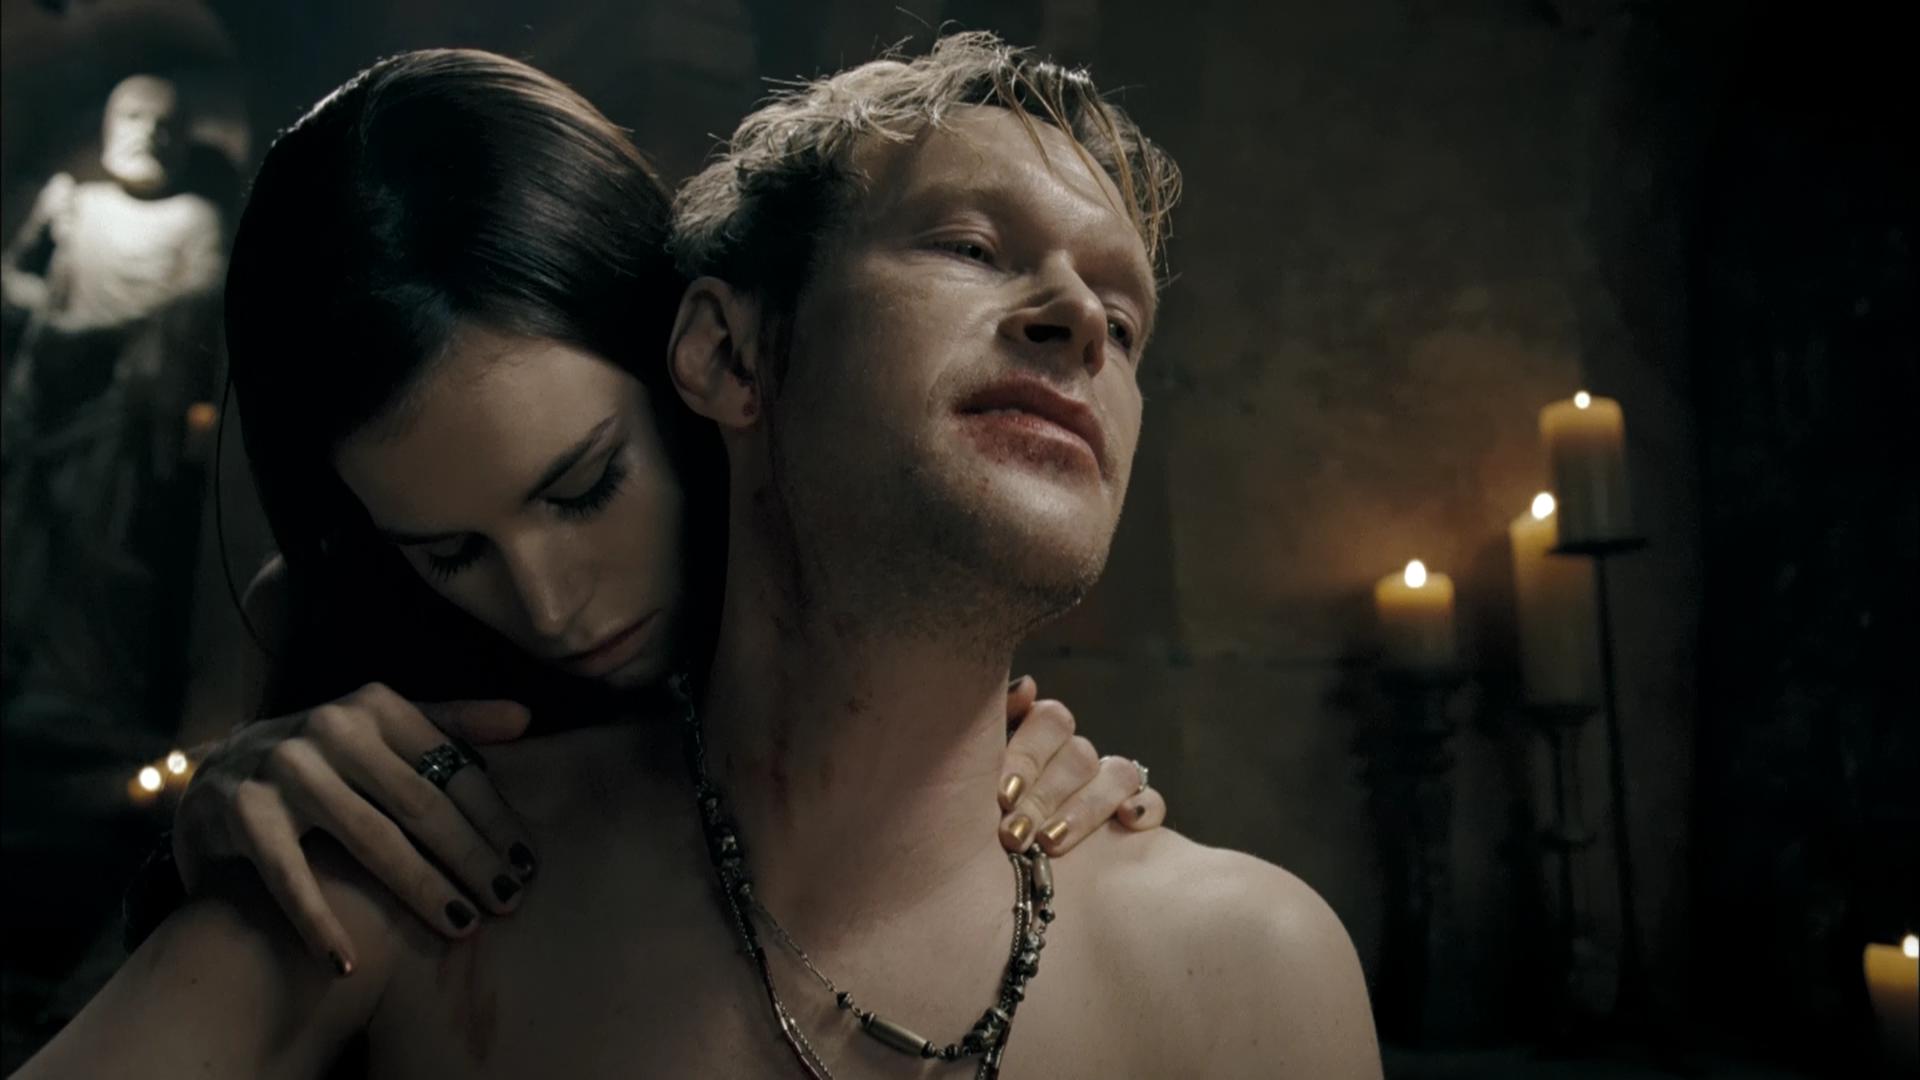 Vampire pov porn pics xfantasy